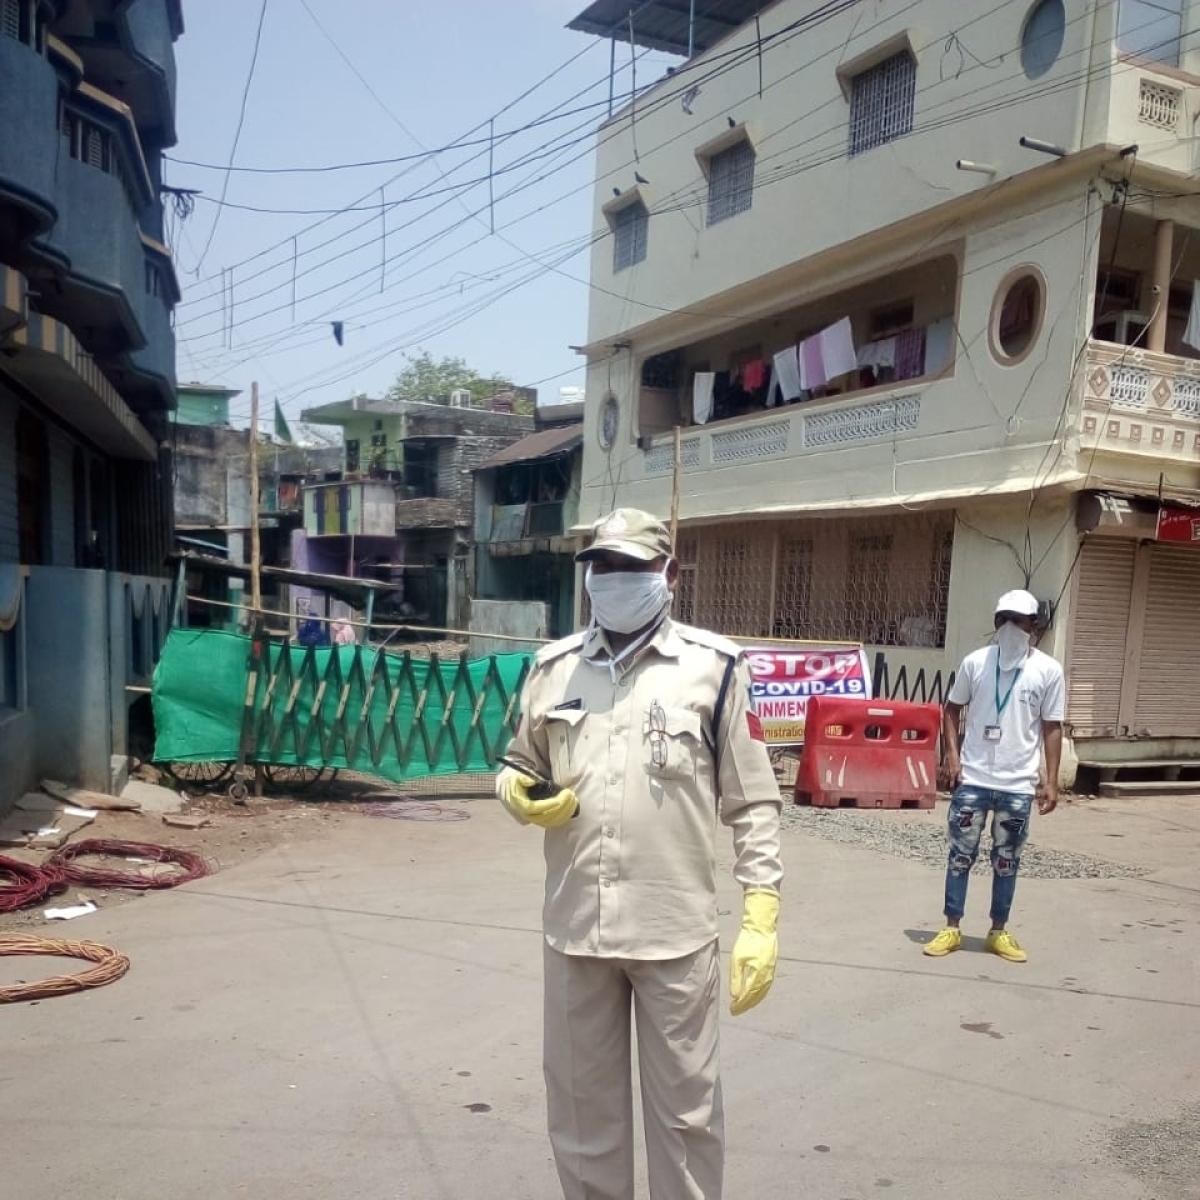 Madhya Pradesh: In Ratlam, 3 more test COVID positive, total active case in district 8